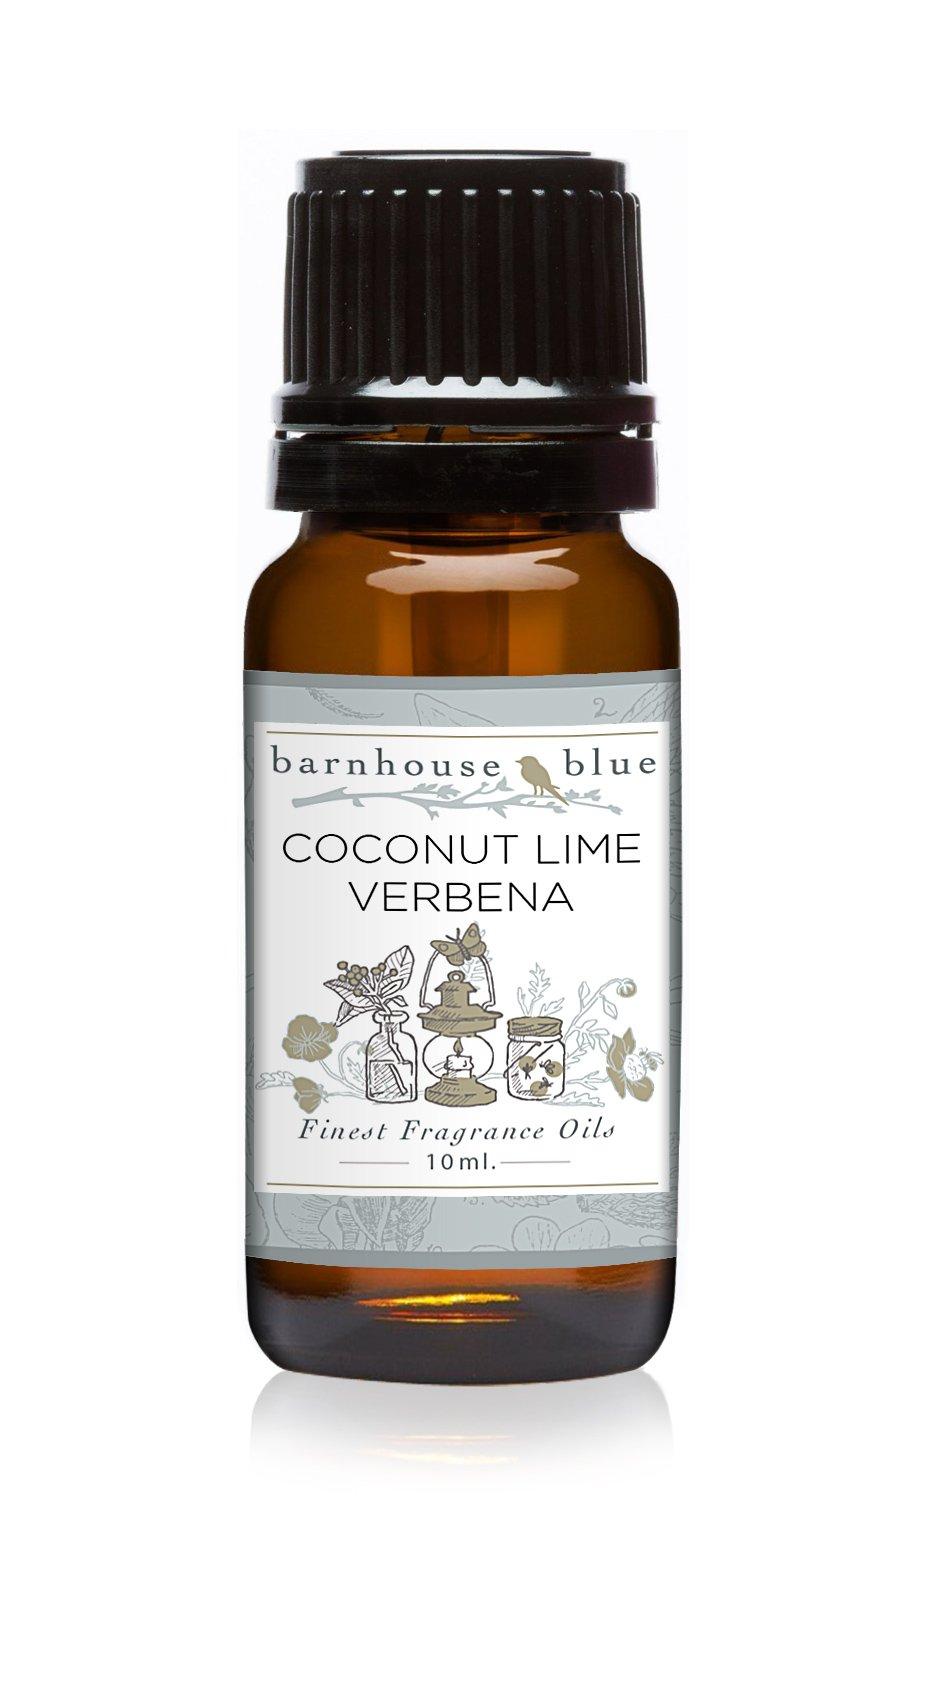 Barnhouse Blue - Coconut Lime VerbenaPremium Fragrance Oil - Scented Oil - 10ml